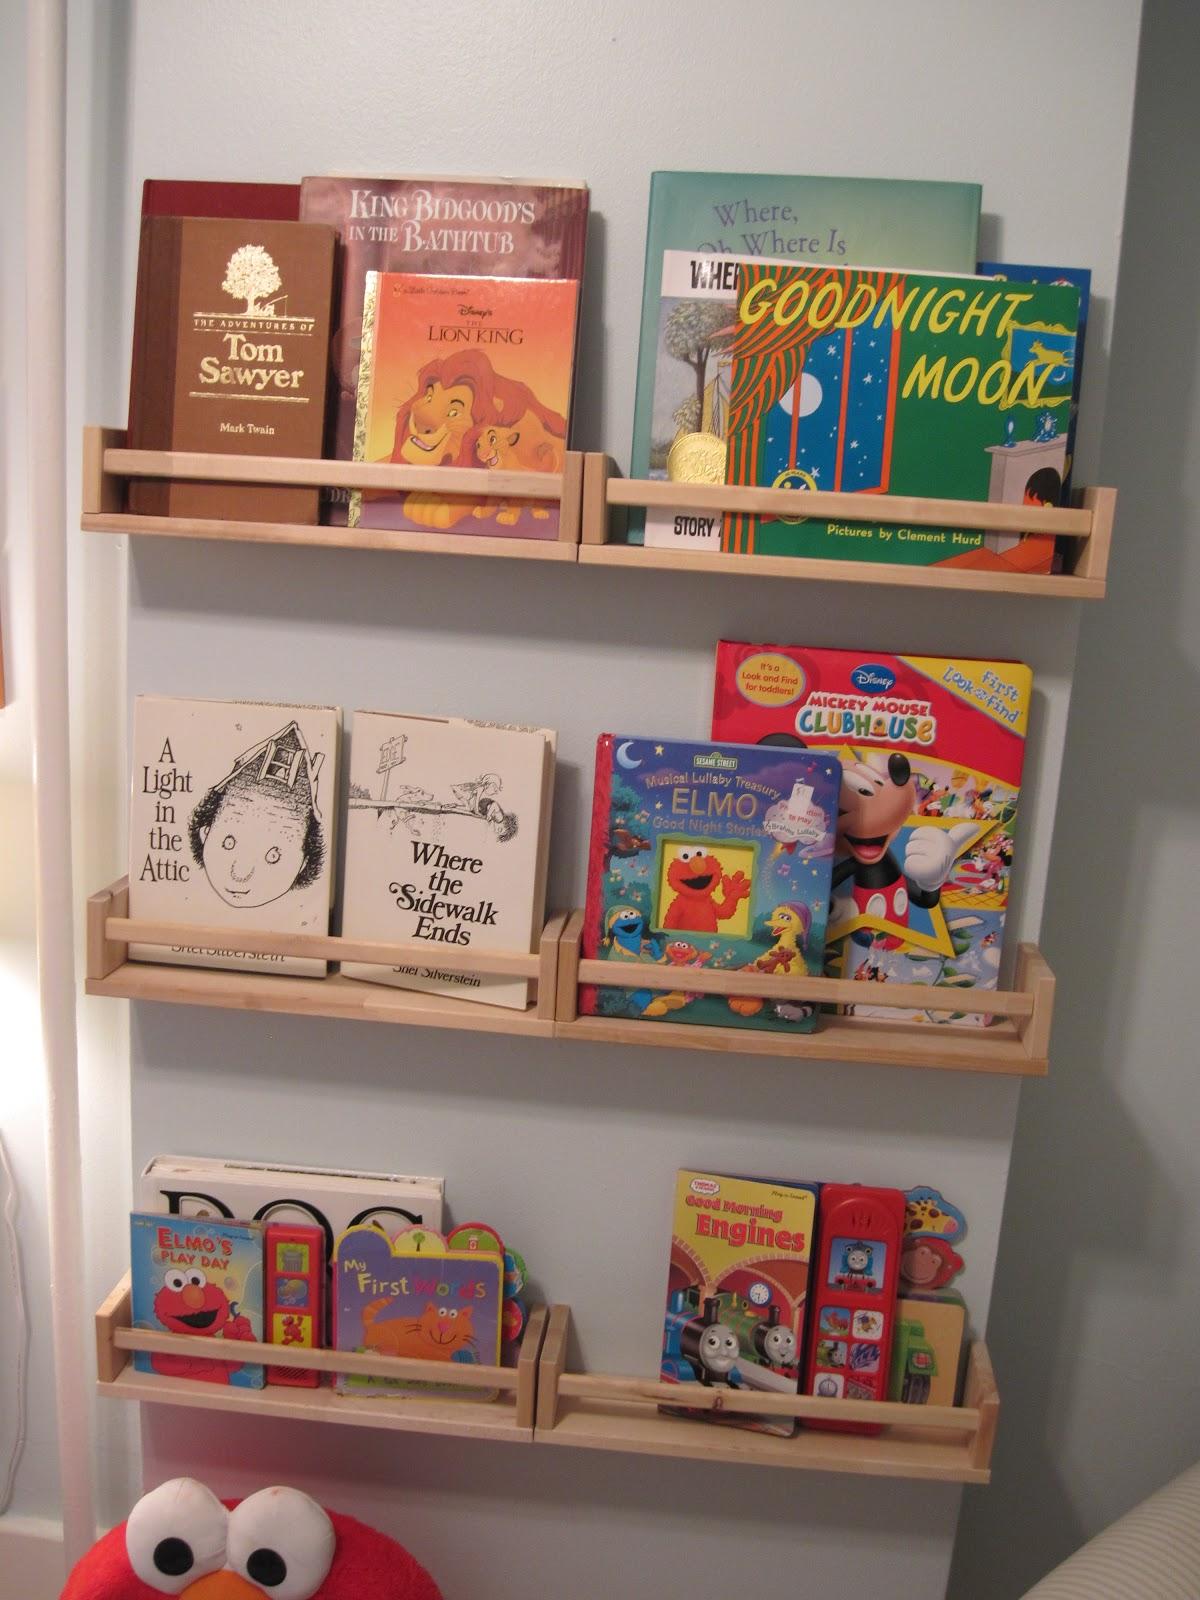 our abode ikea spice racks as bookshelves